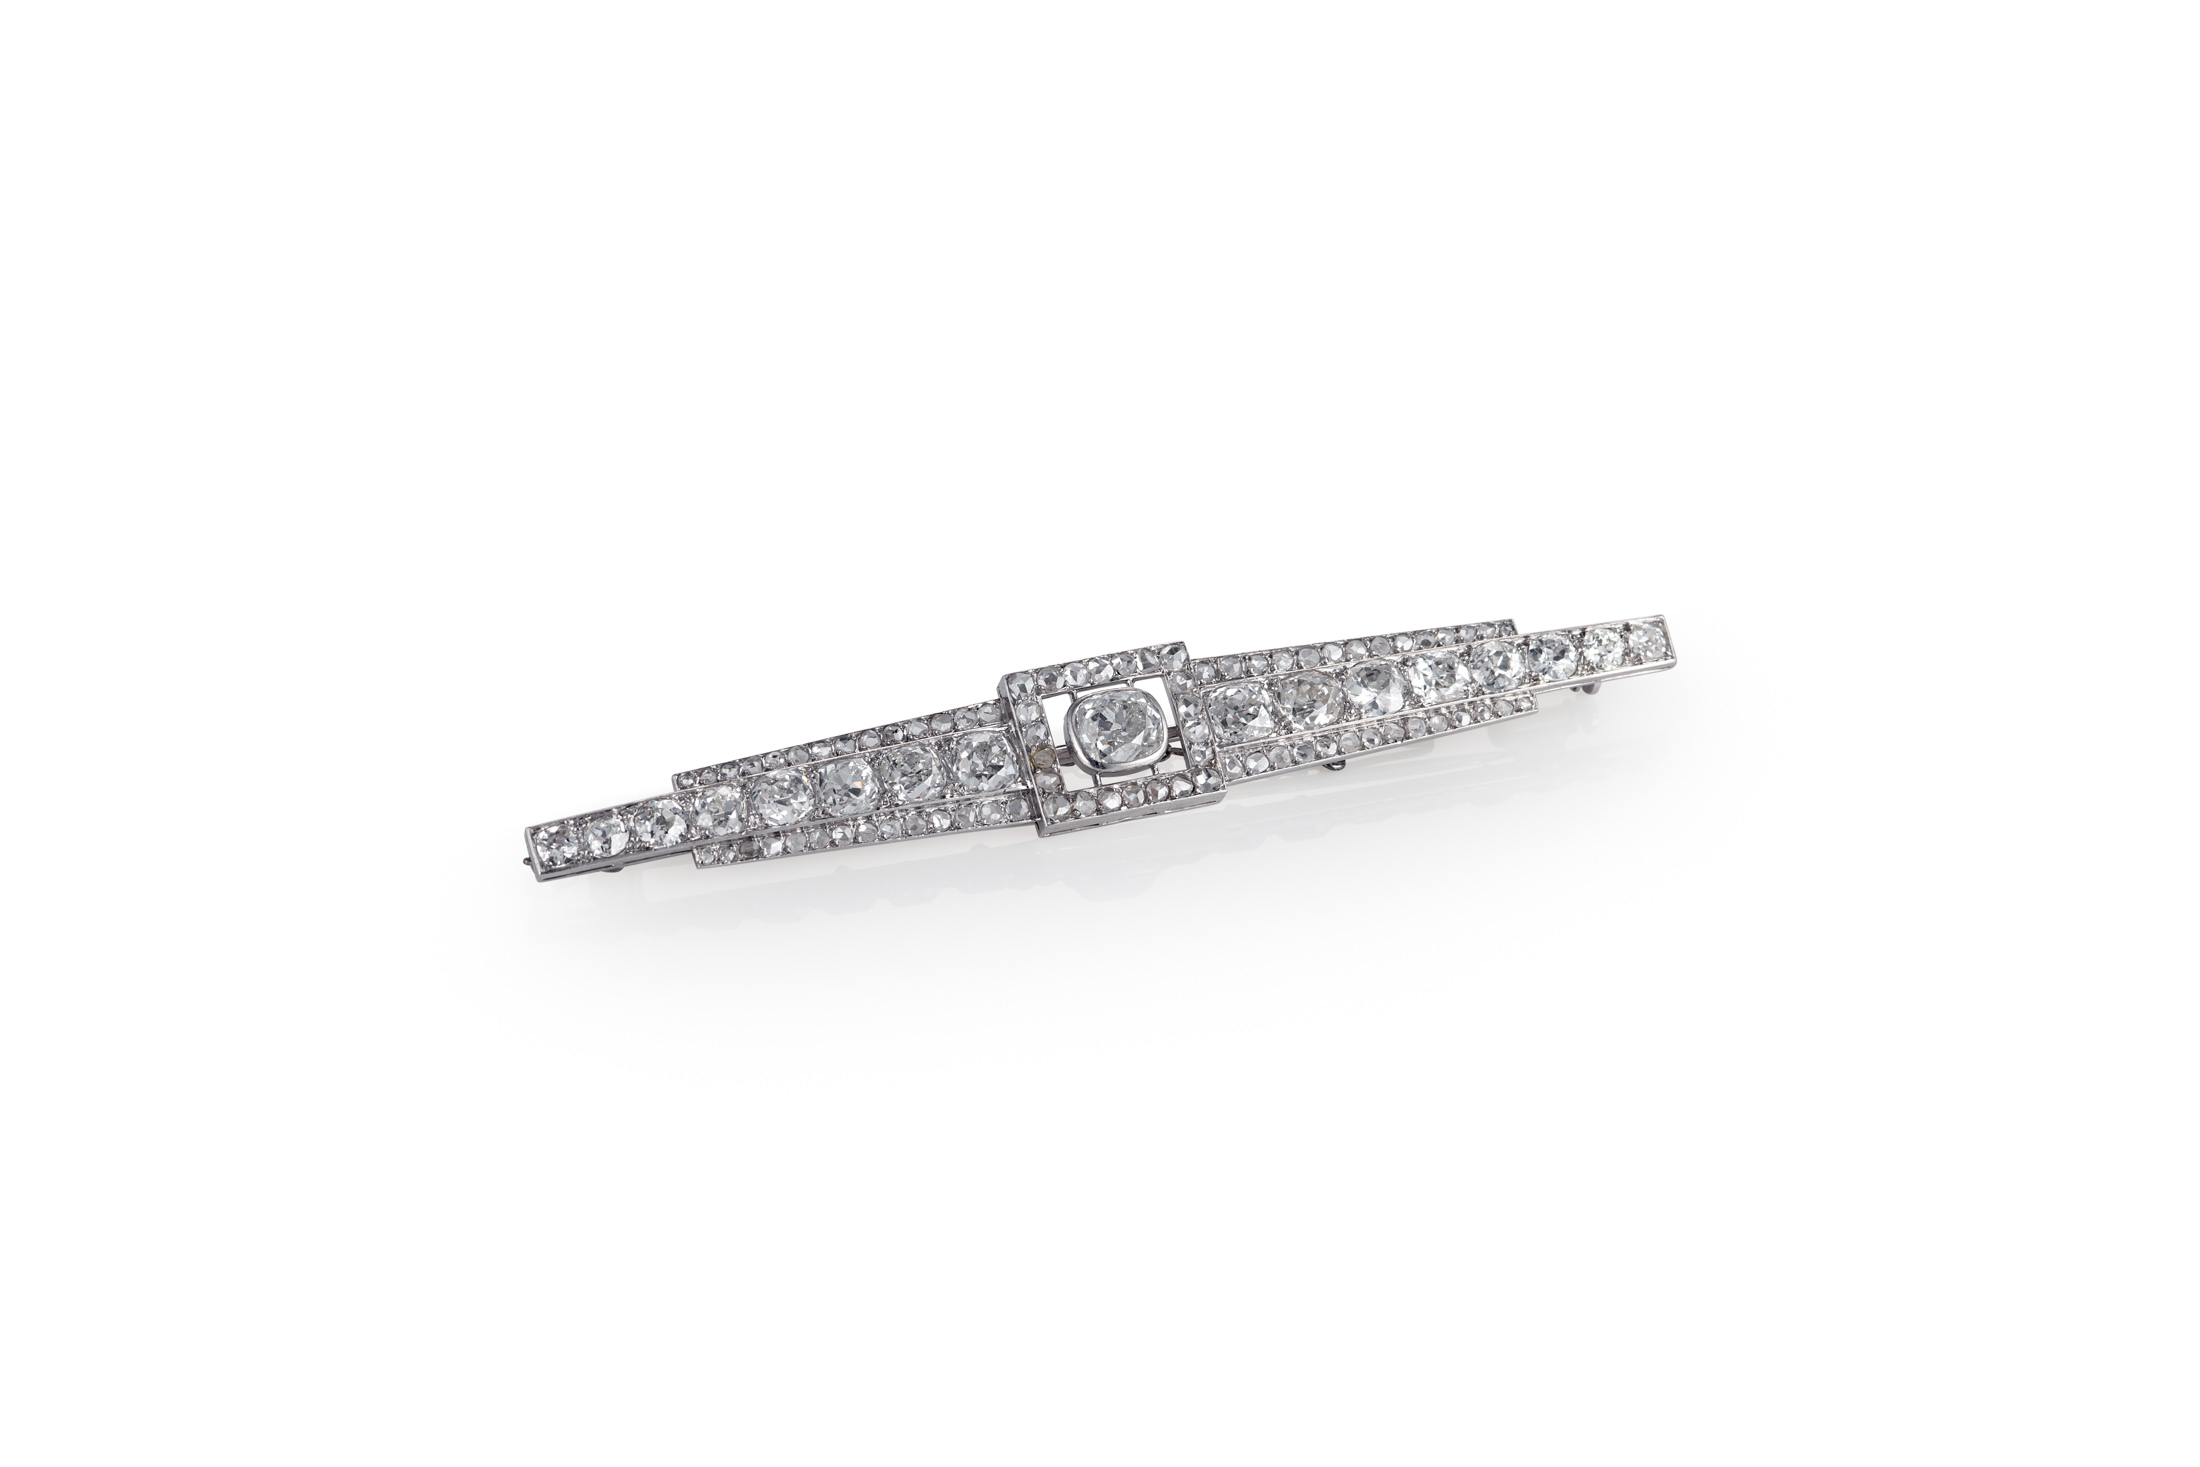 French Art Deco Diamond and Platinum Bar Brooch. Photo: Cheffins